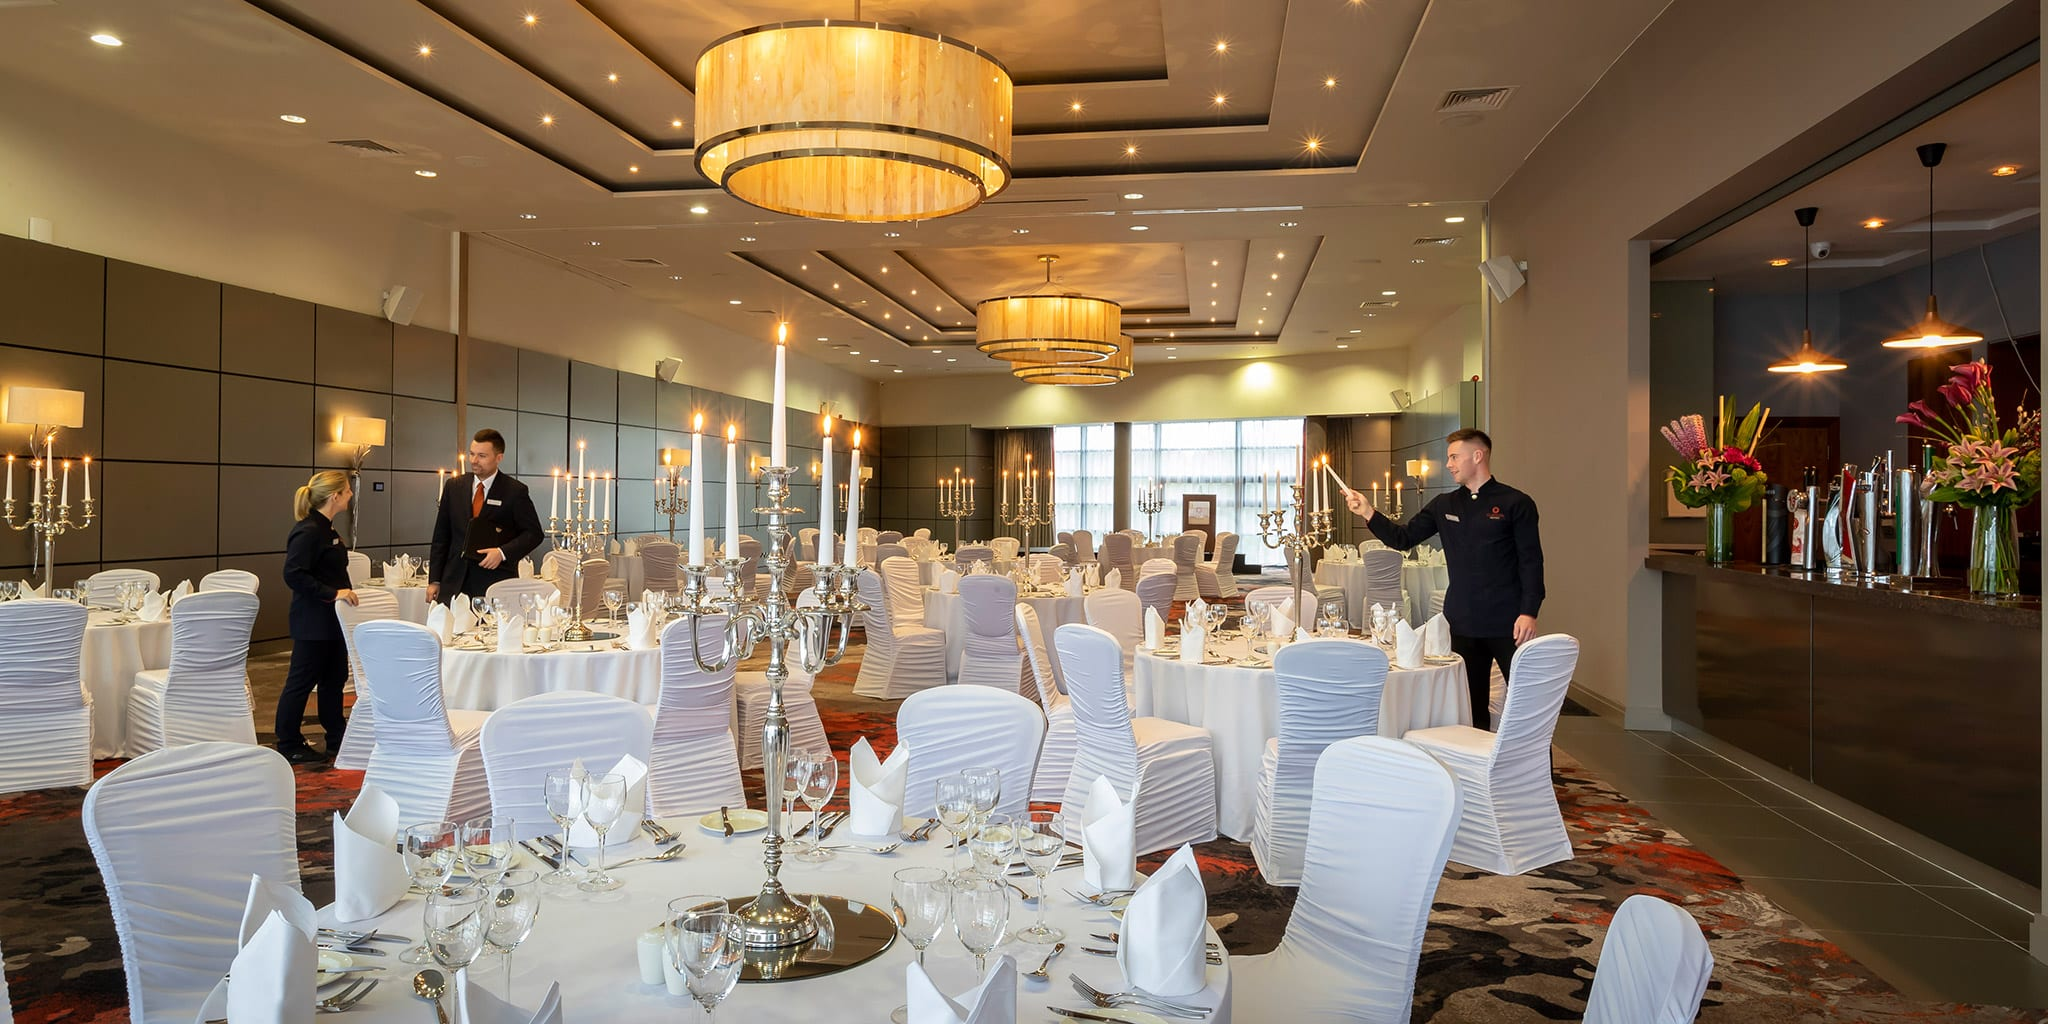 Staff preparing event venue in banquet style